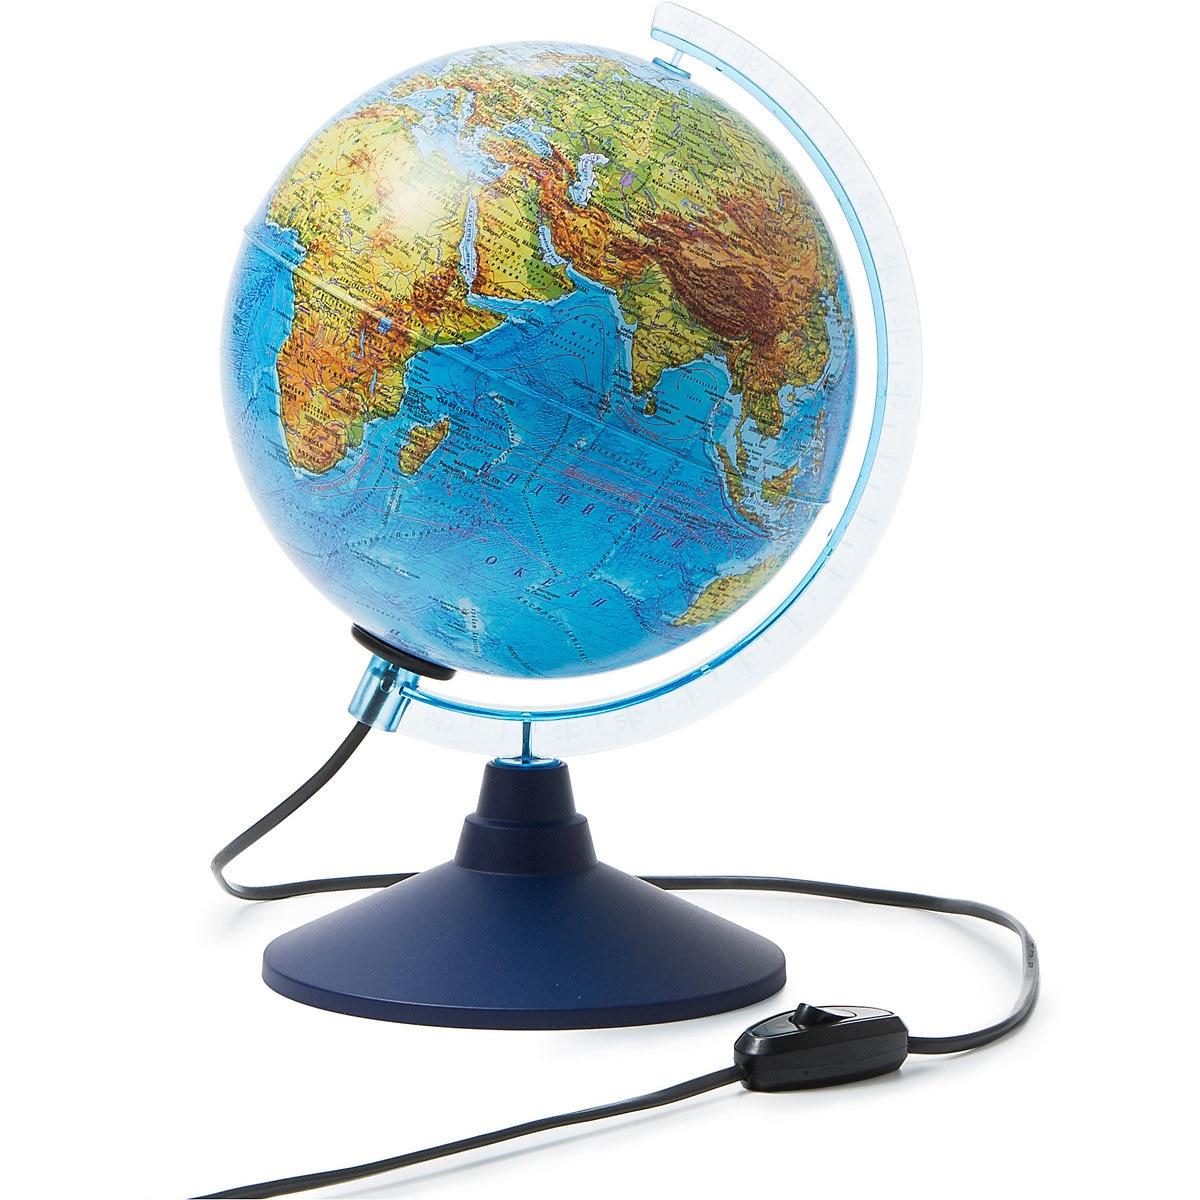 GLOBEN Desk Set 7327224 Globe Accessories Organizer For Office And School Schools Offices MTpromo